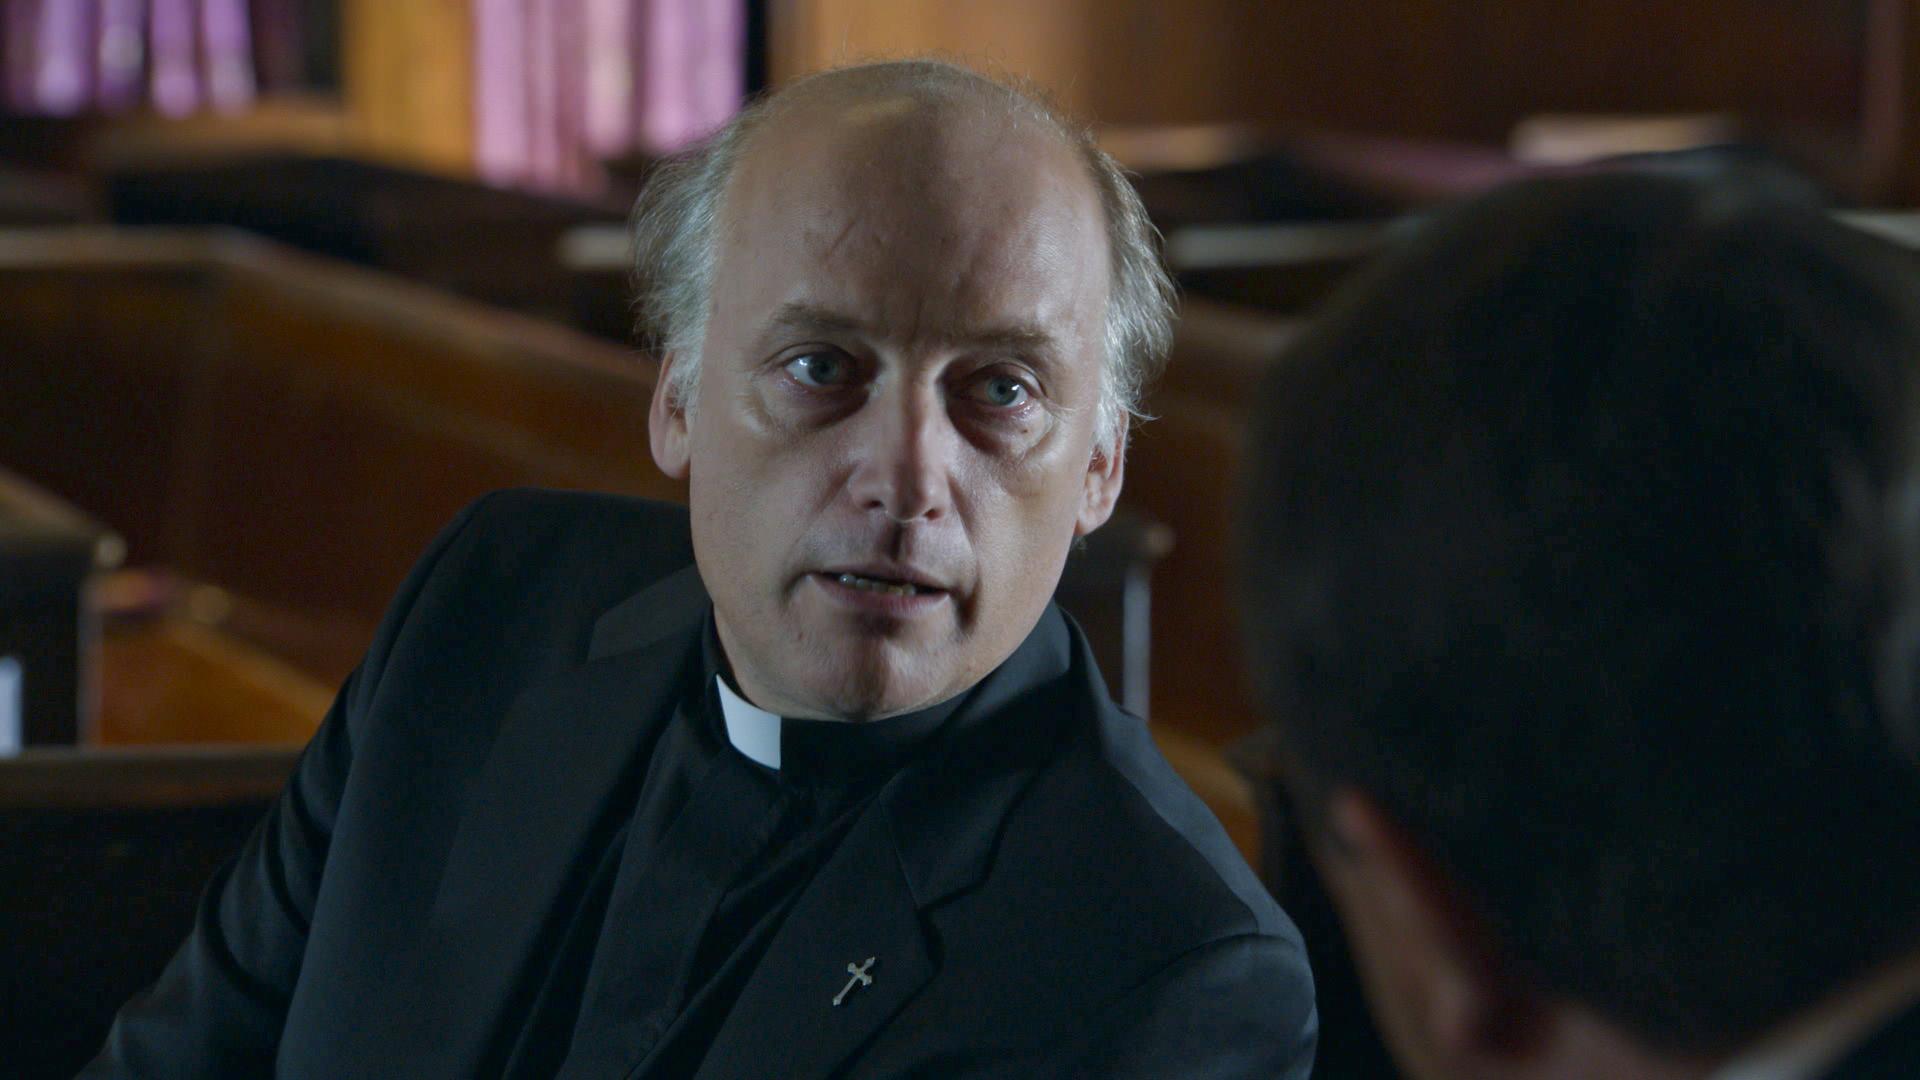 Father Markhum